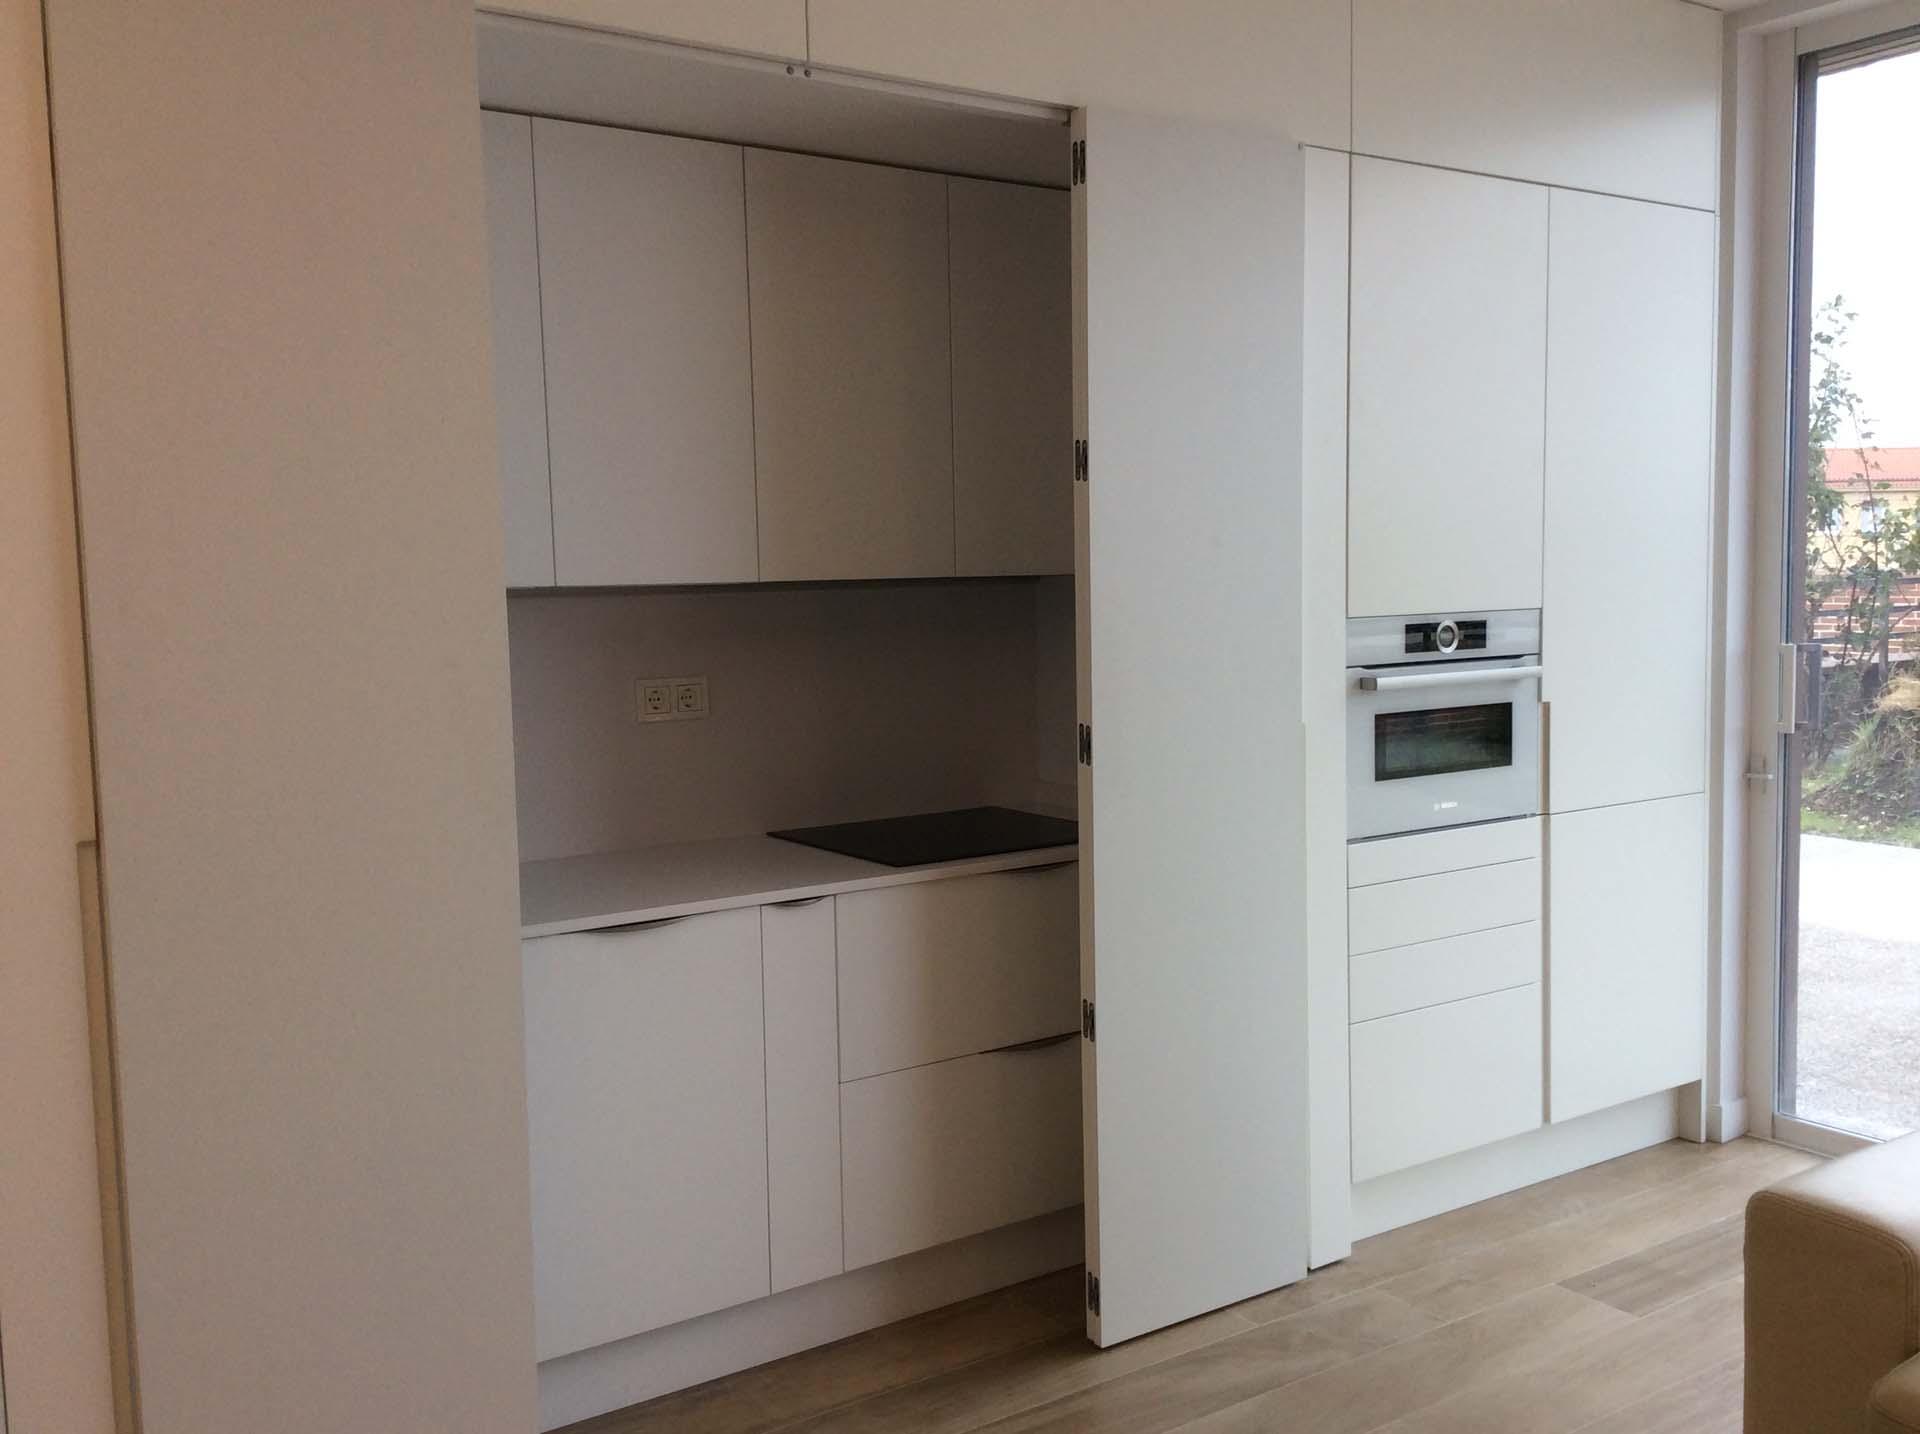 Puertas cocina escamoteable plegadas arnit - Puertas plegables cocina ...